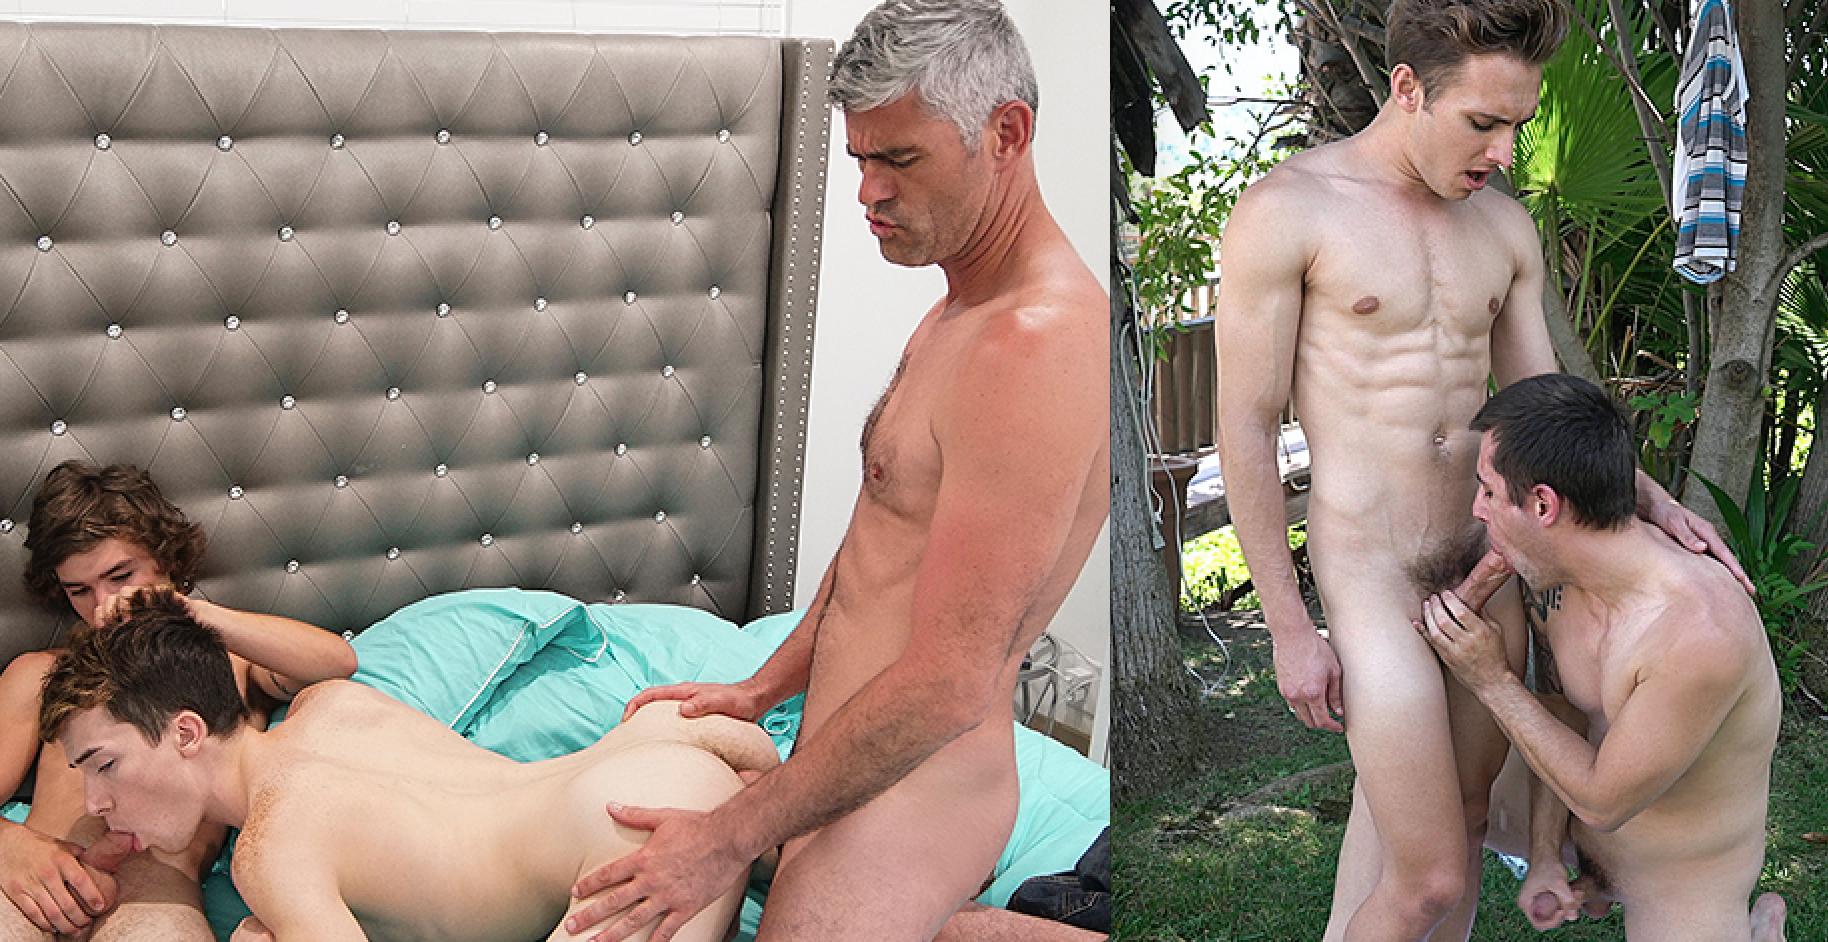 family dick gay porn alex meyer bareback